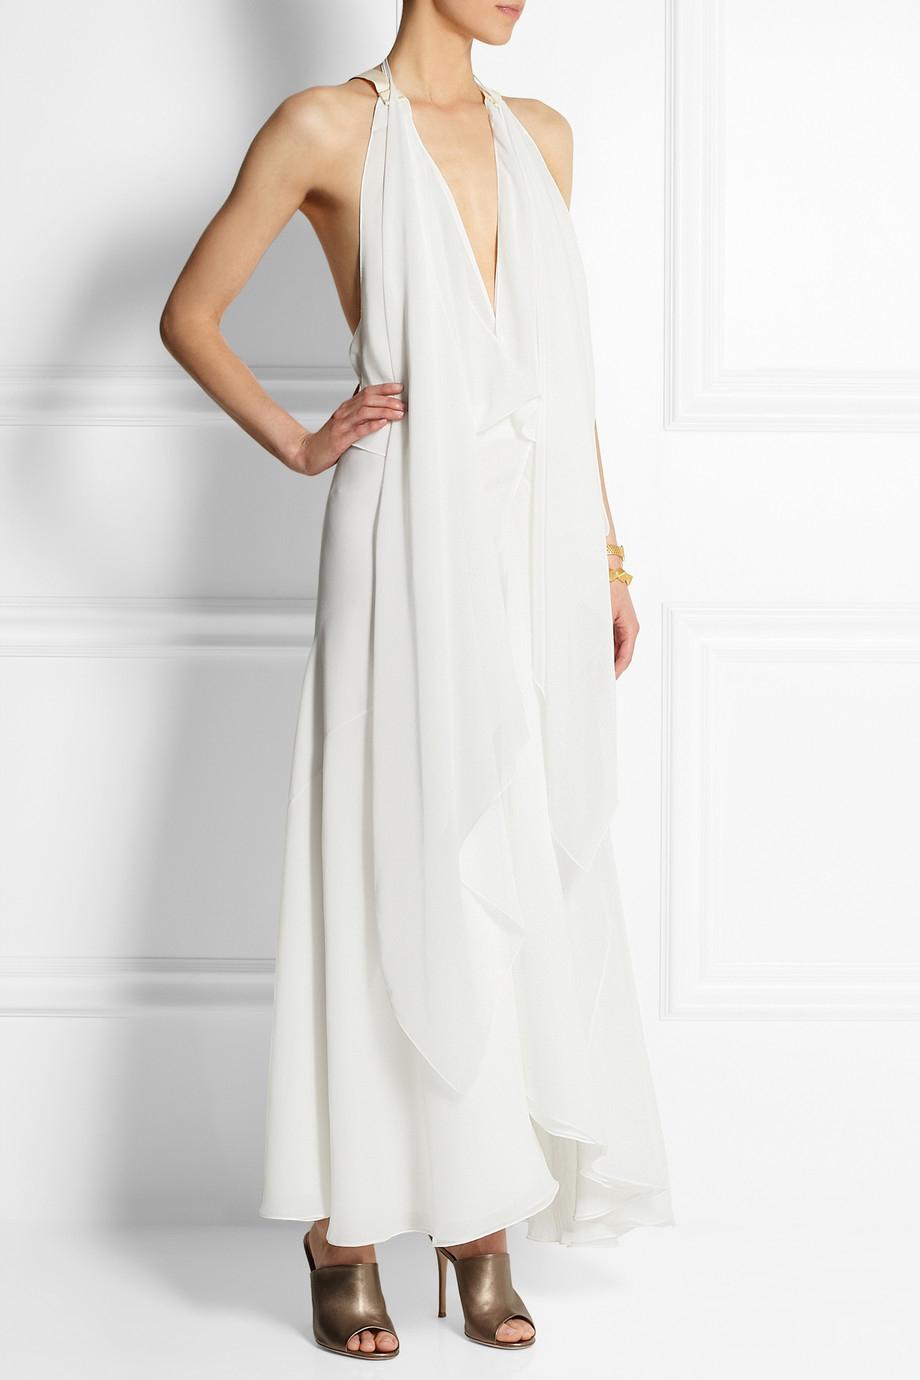 29daf99dd9 Chloé Draped Crepe Maxi Dress in White - Lyst